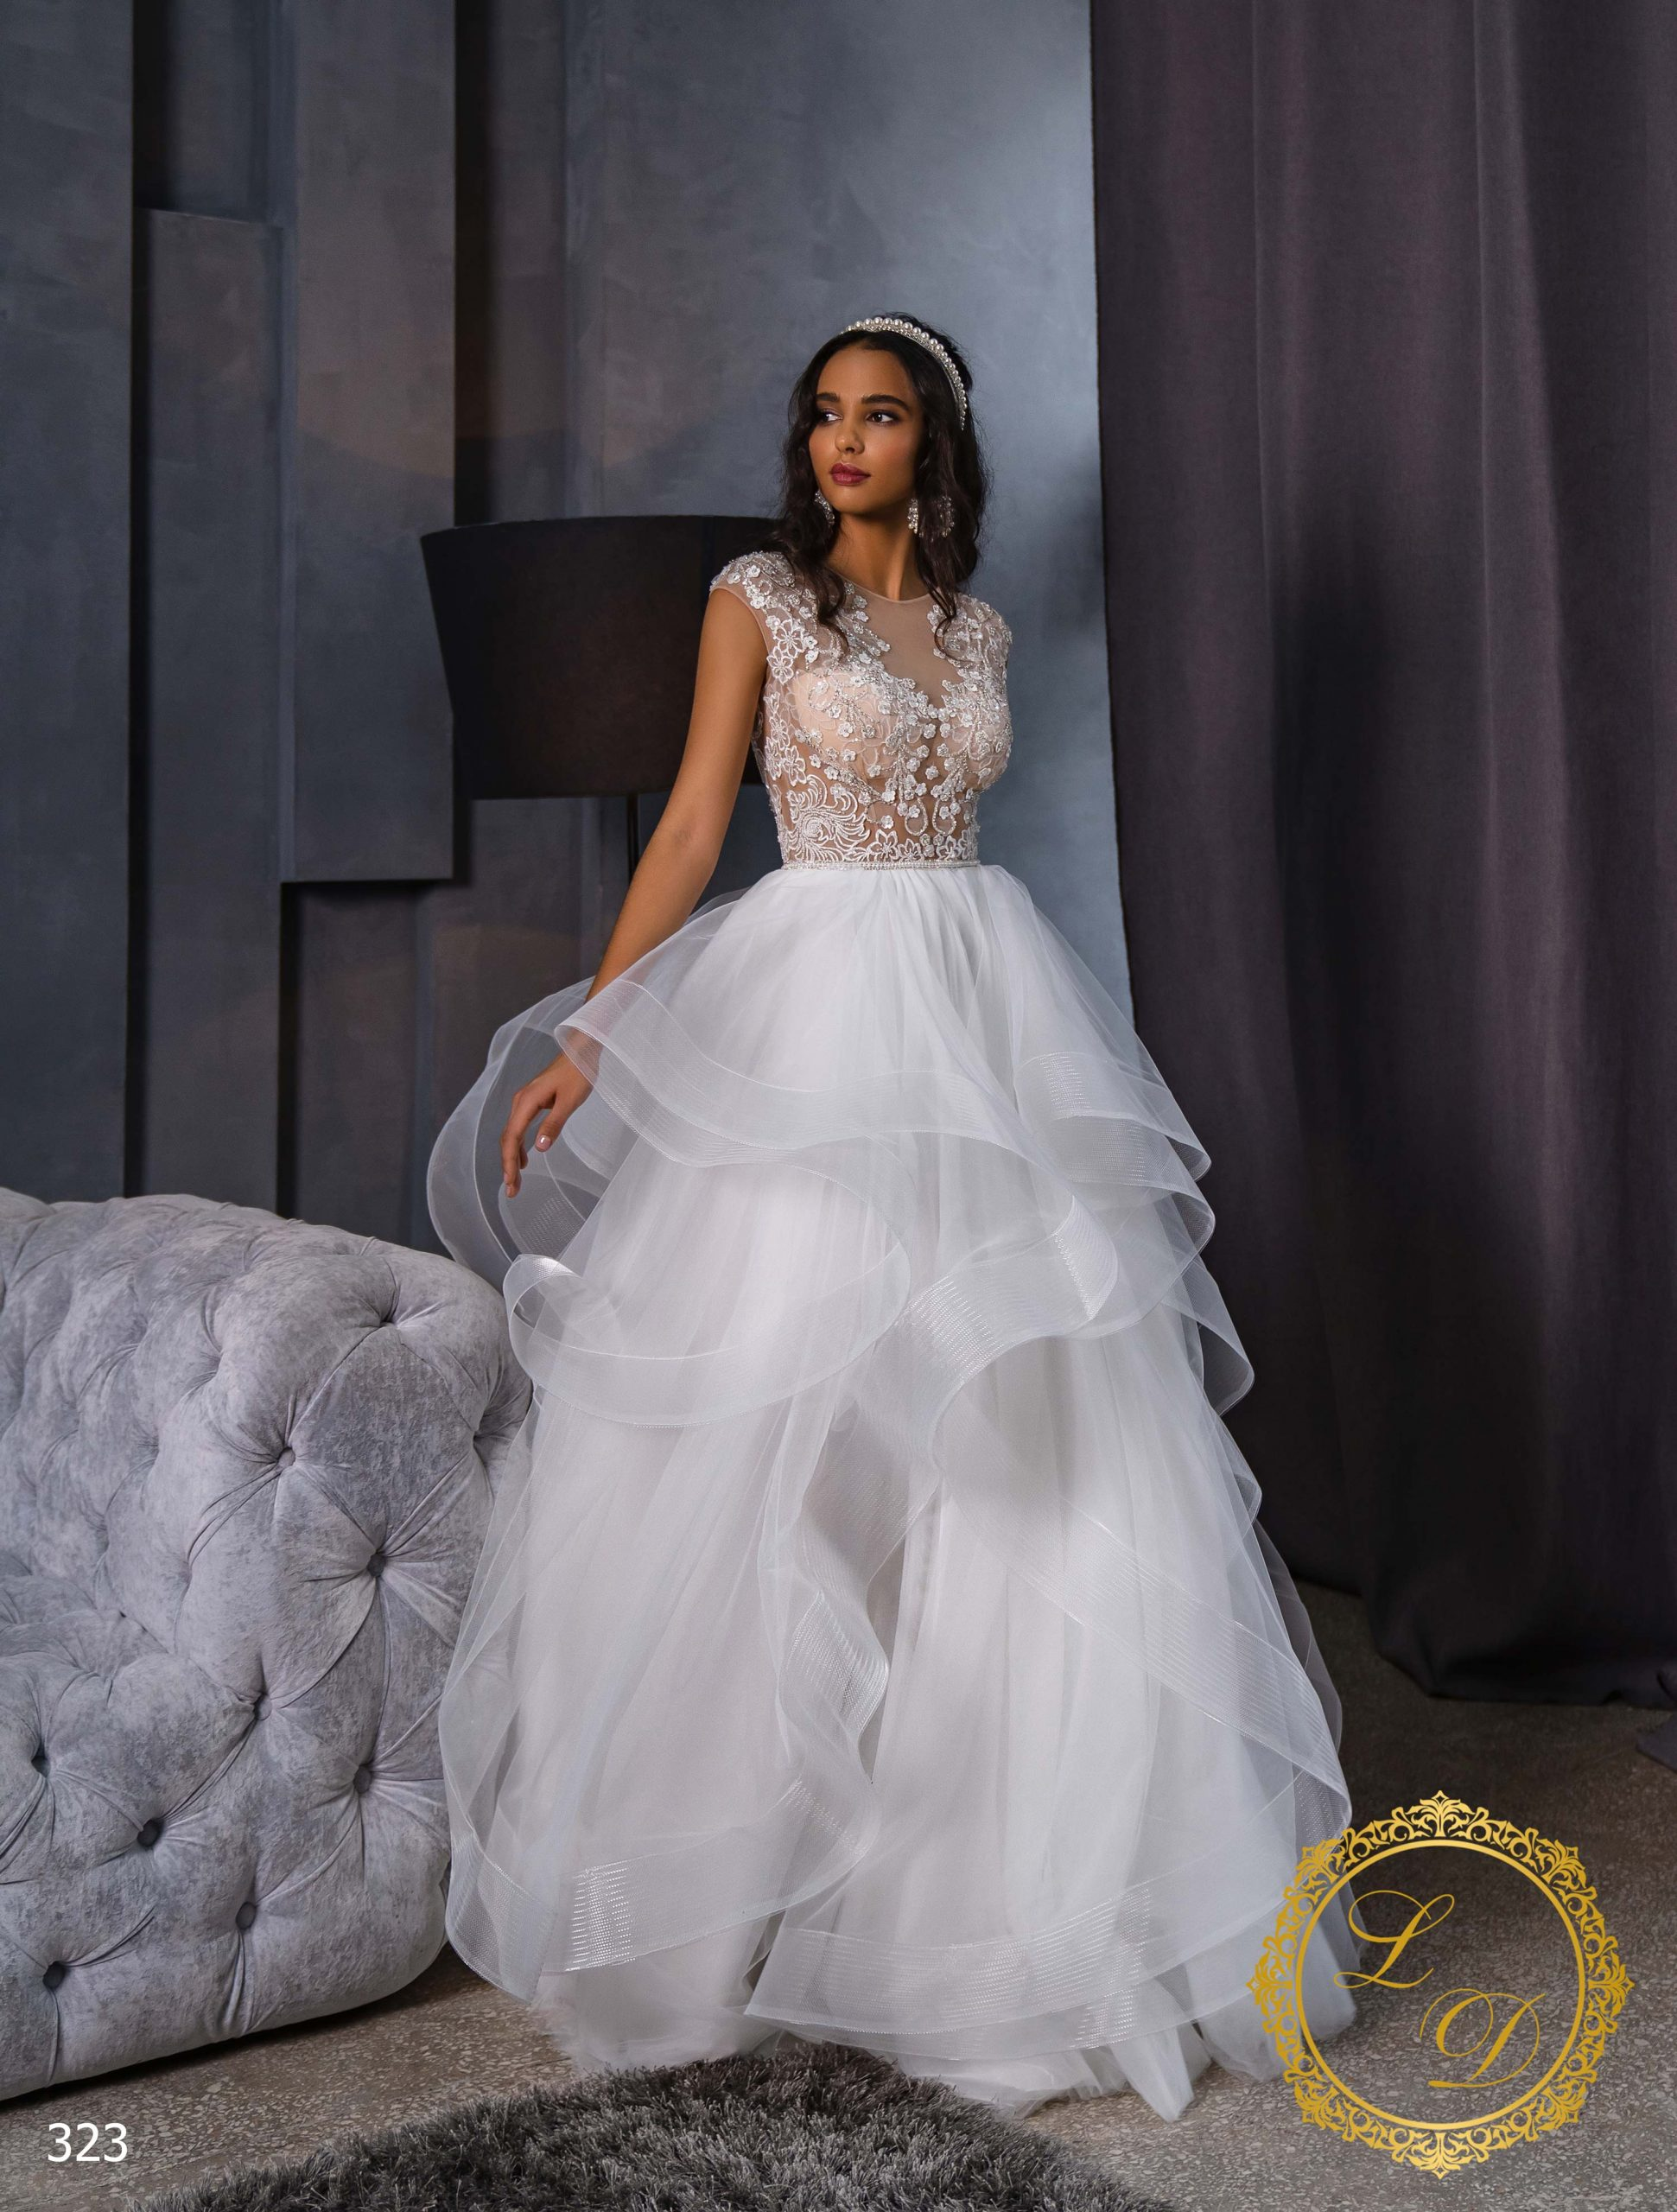 Wedding Dress Lady Di 323-2